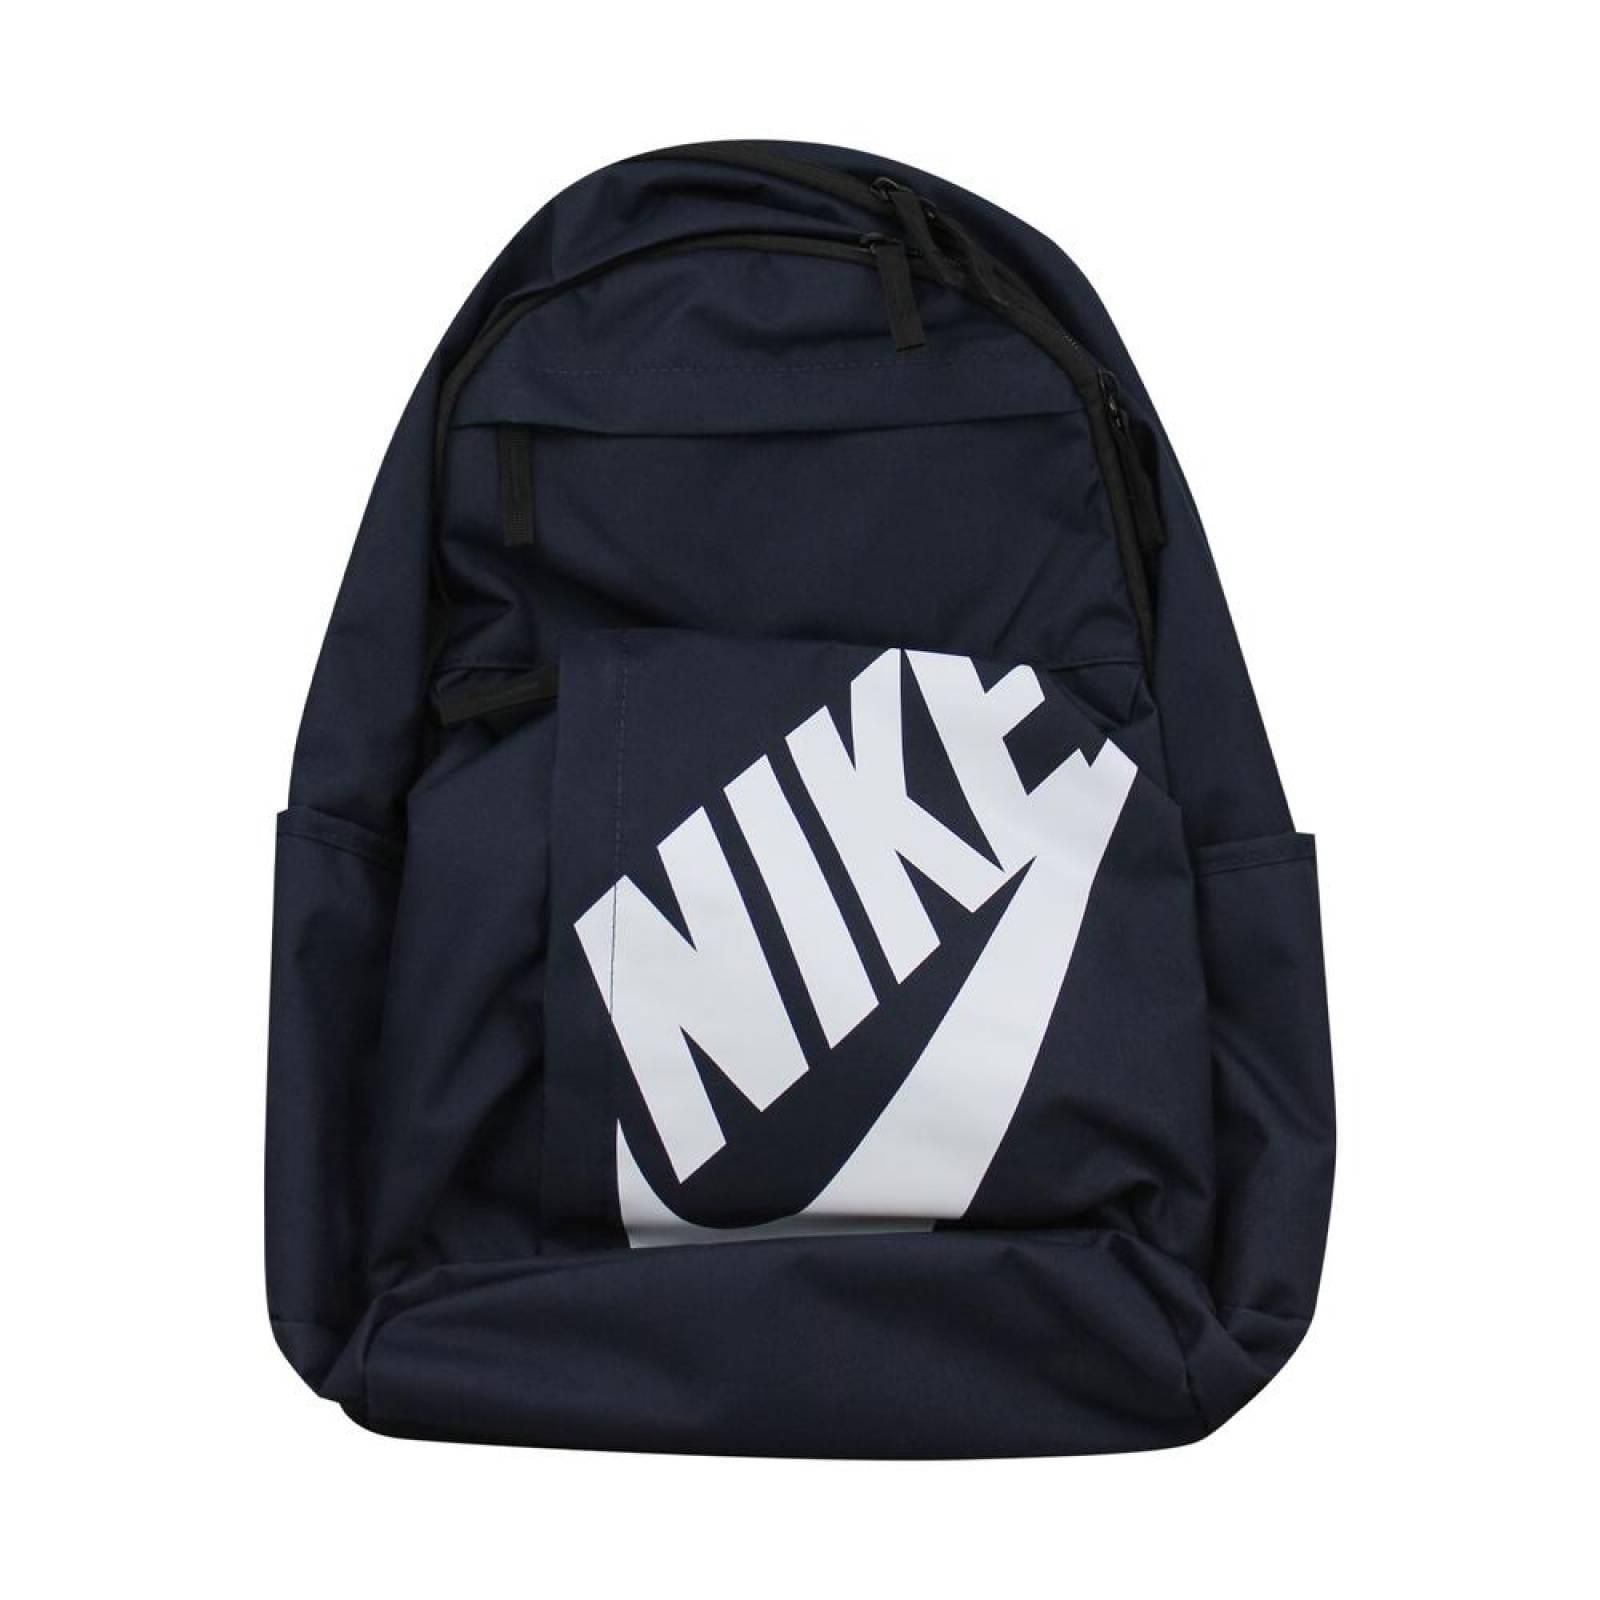 Mochila Nike Elemental 5381010 Azul Marino